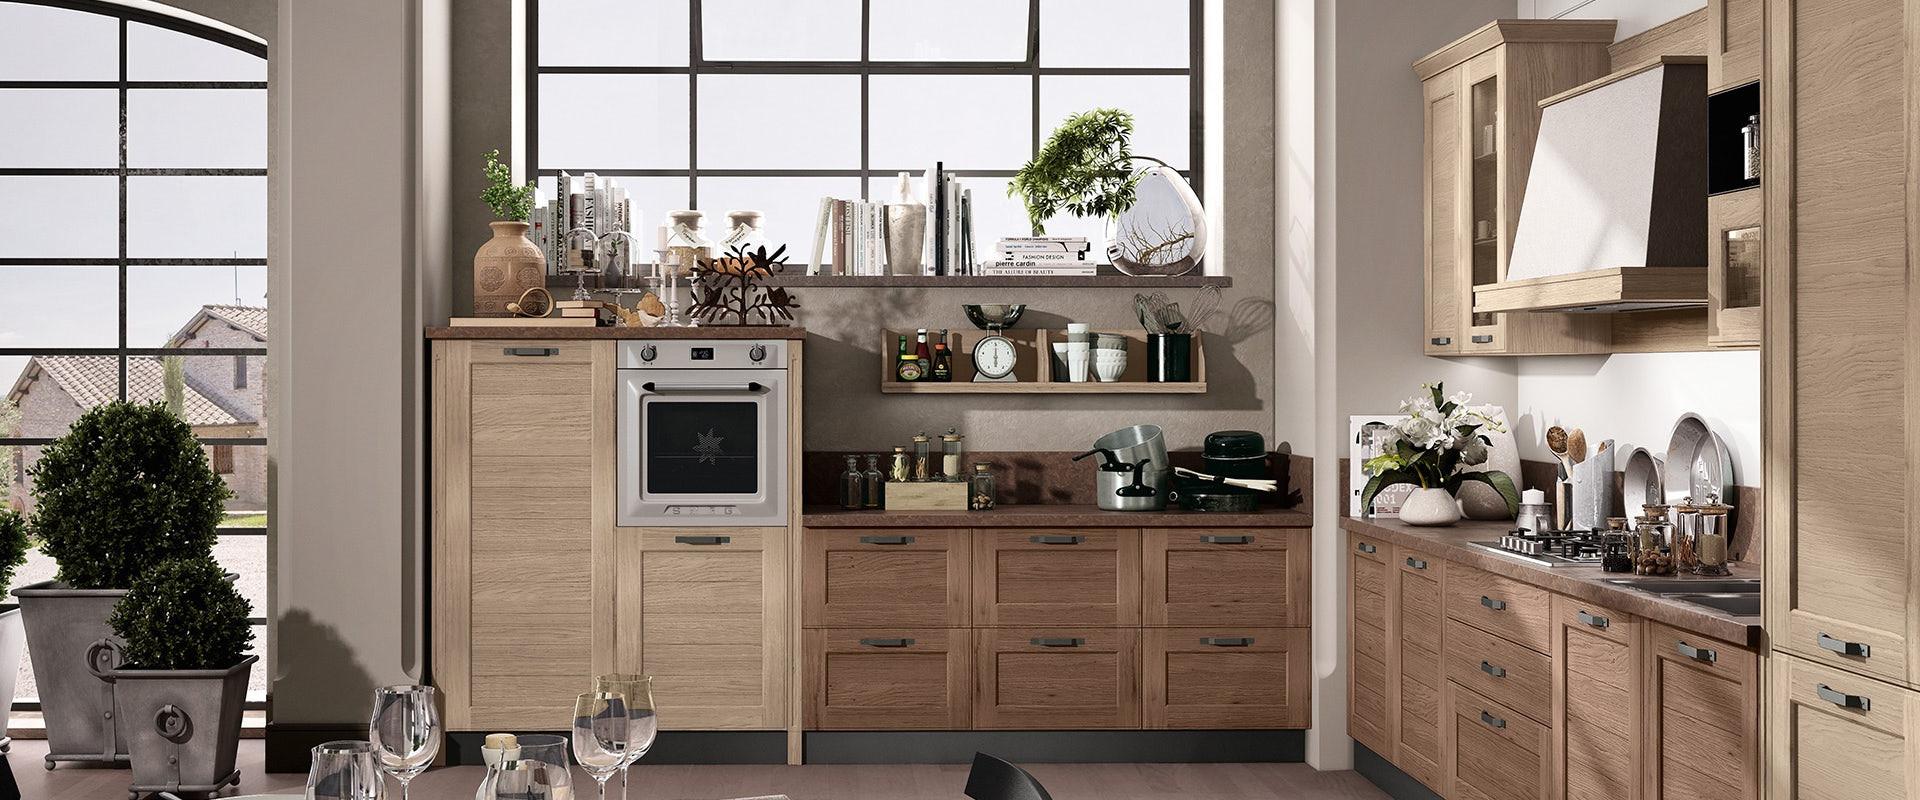 stosa-cucine-classiche-york-229.jpg